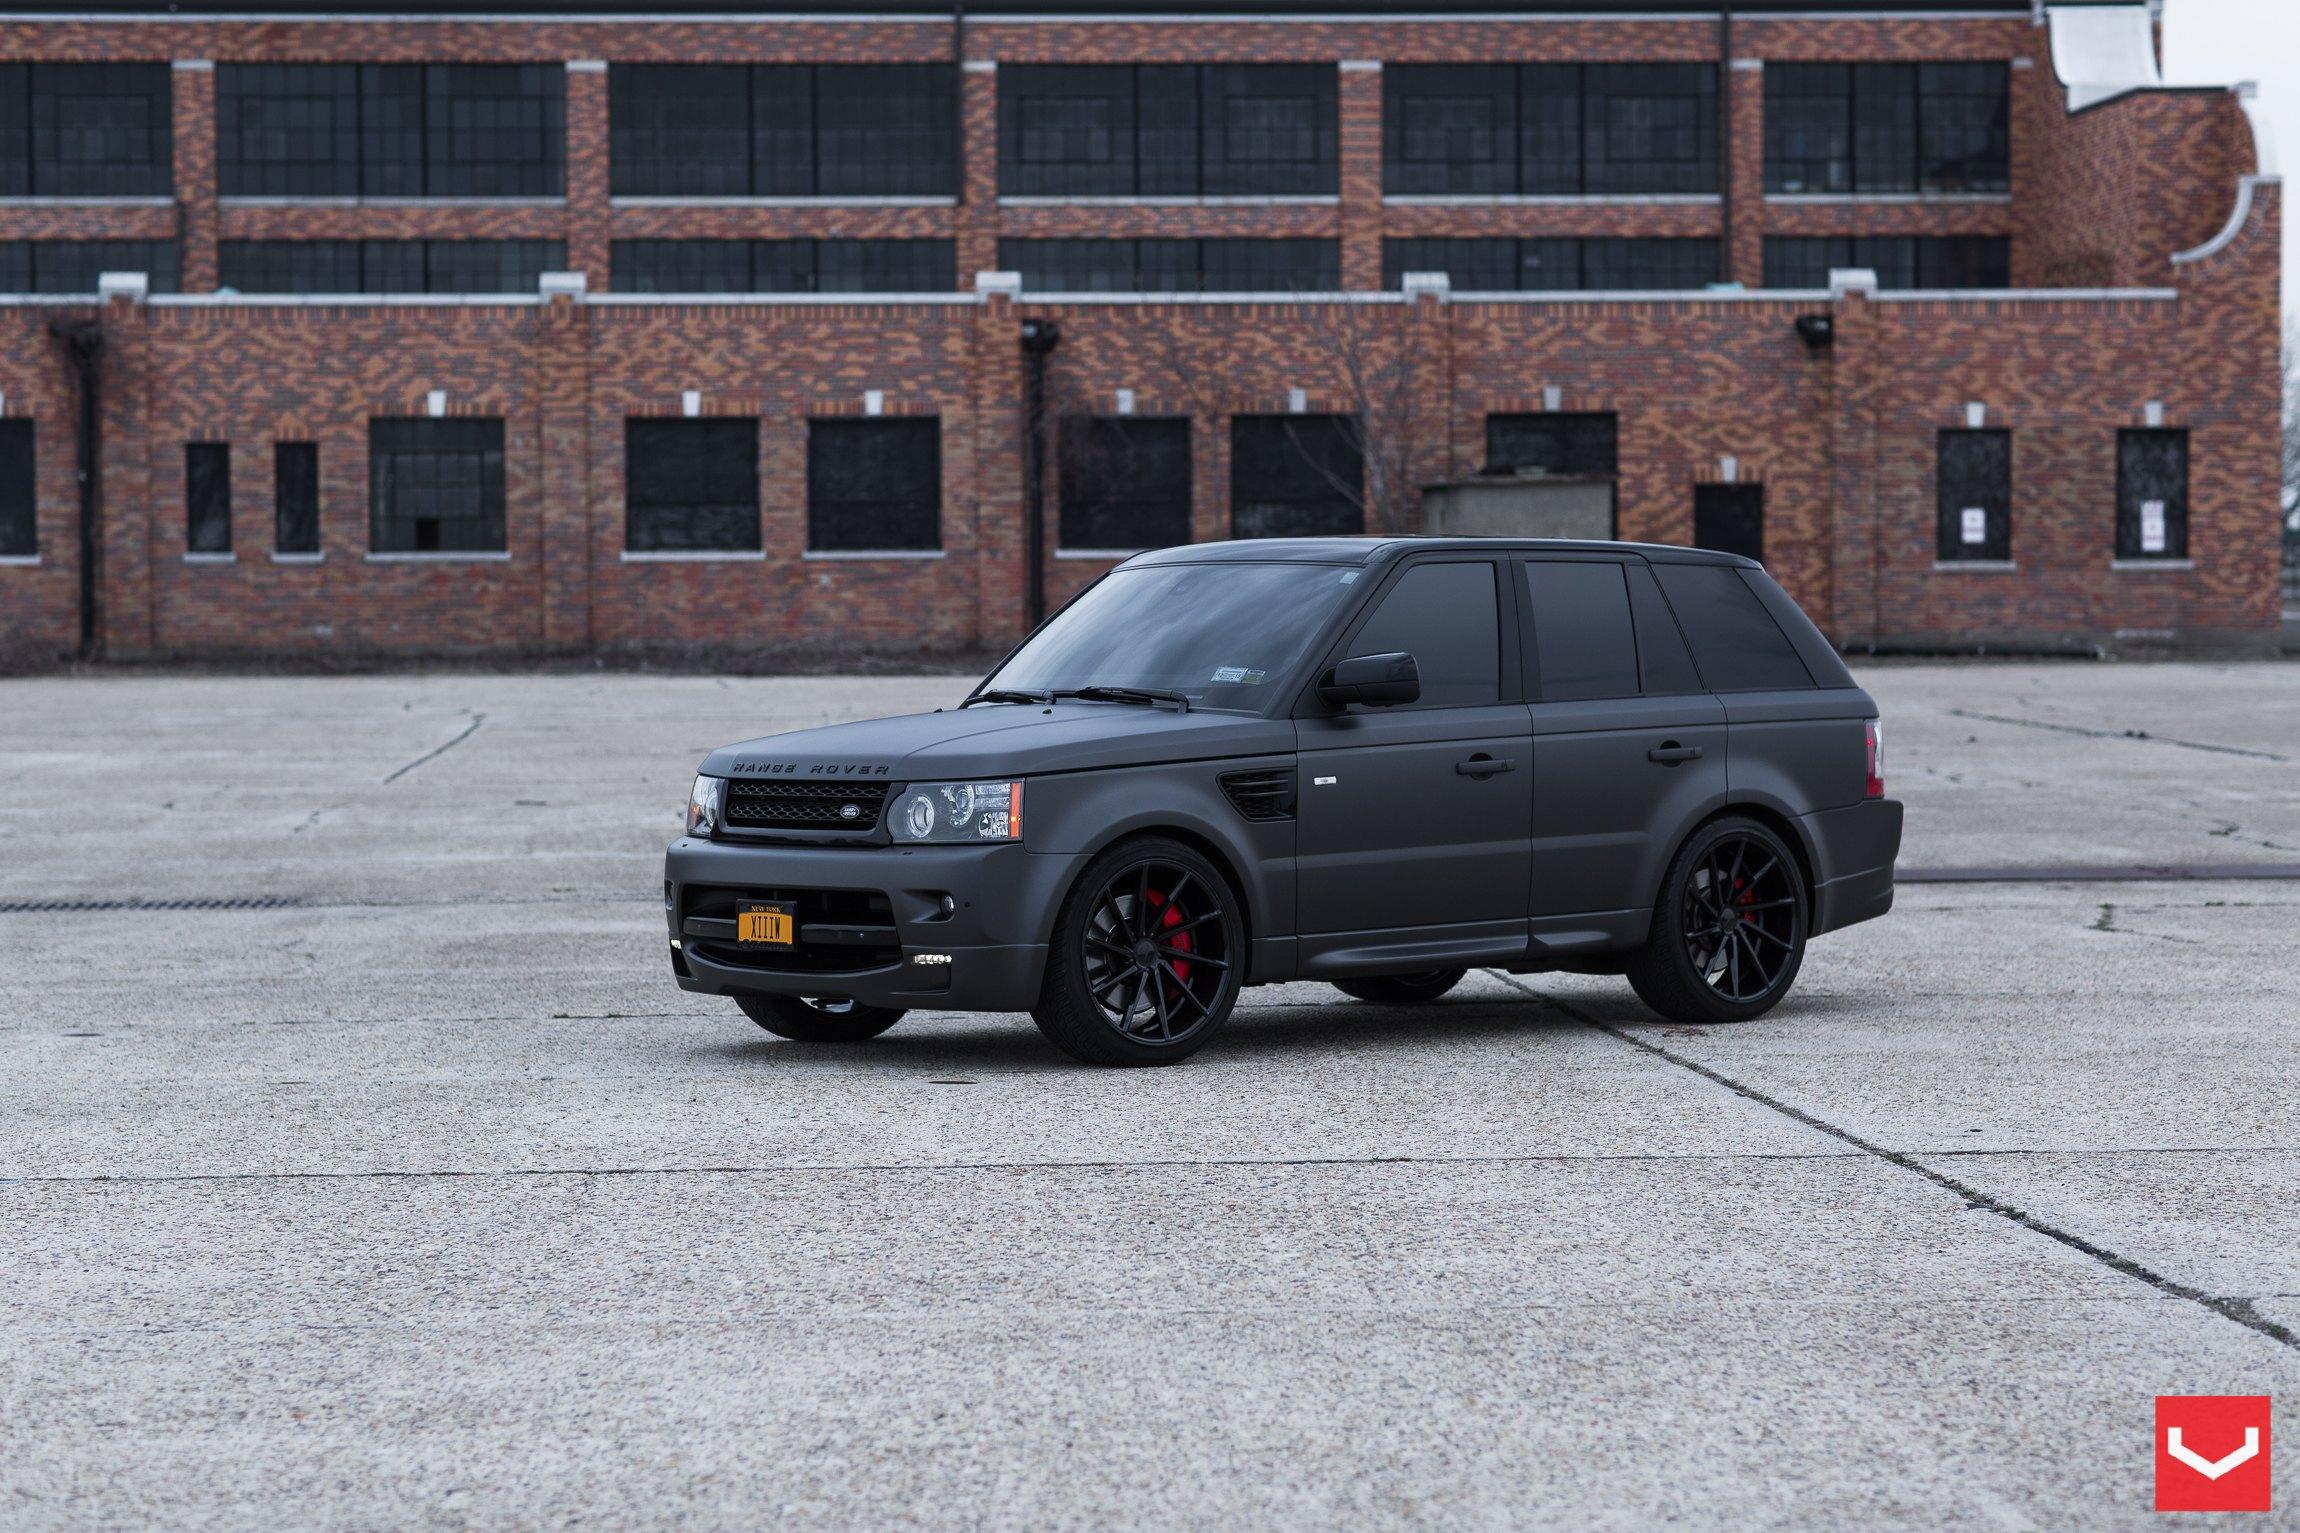 Black On Black Matte Land Rover Range Rover Sport With